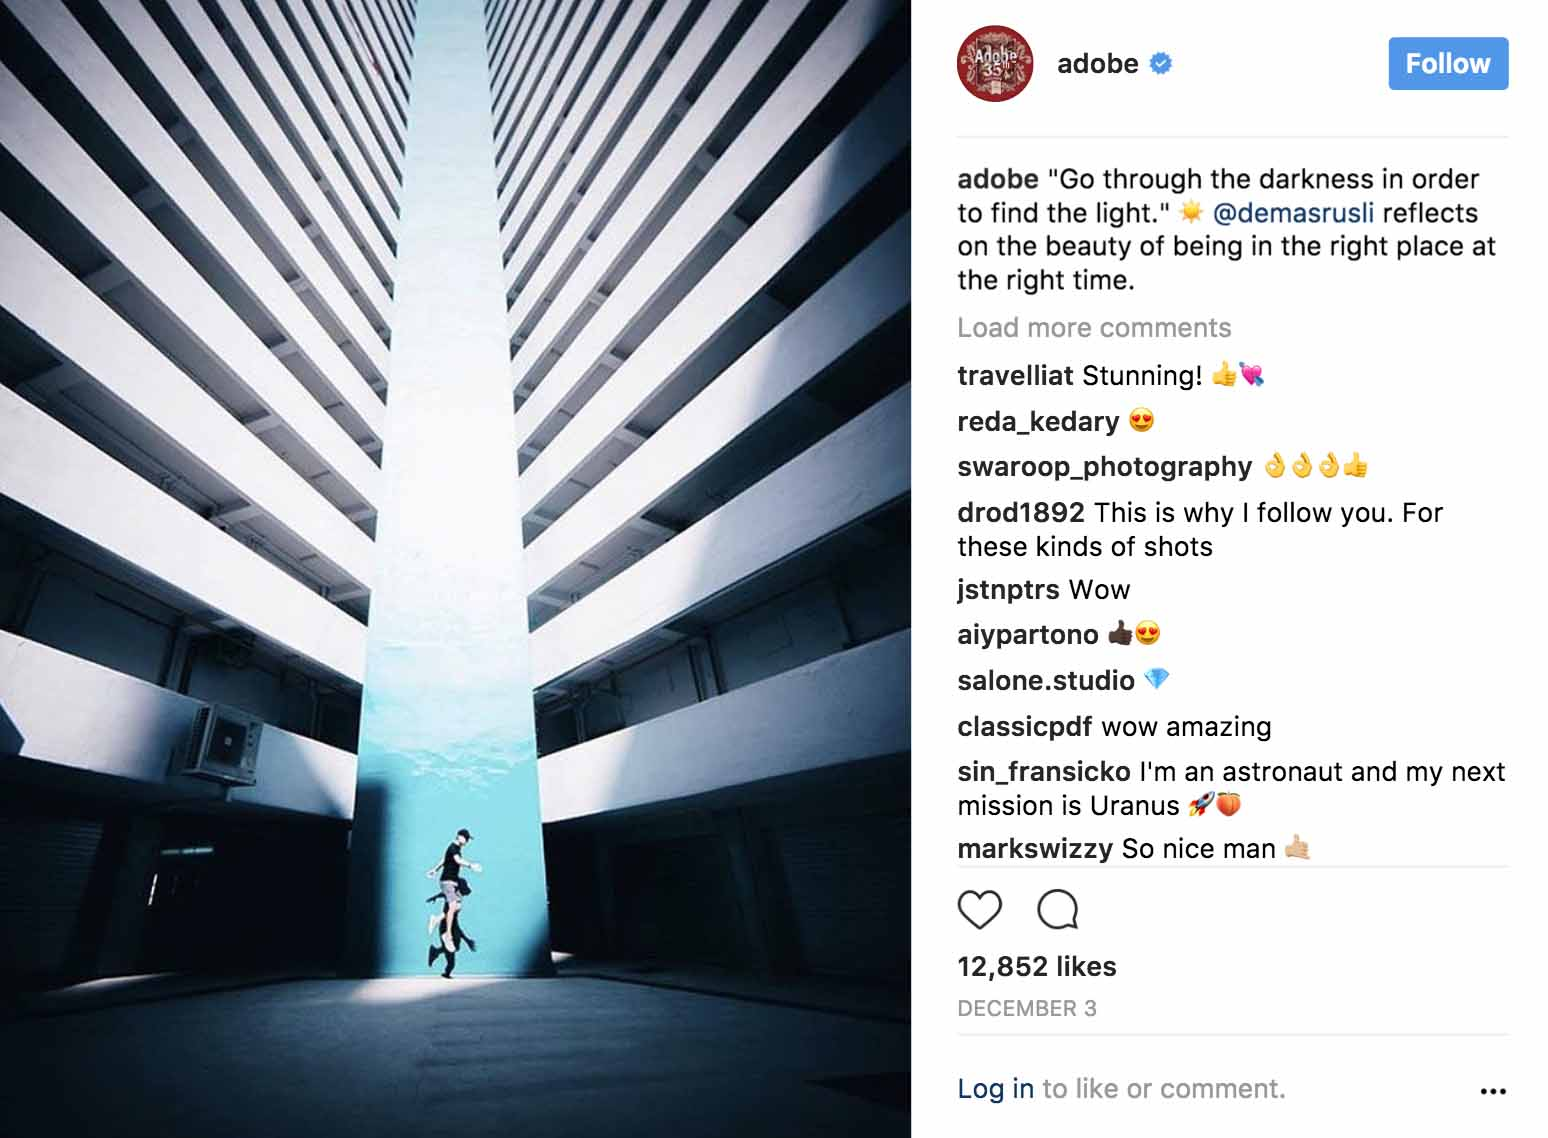 Instagram Marketing 2017 - Adobe - Sked Social